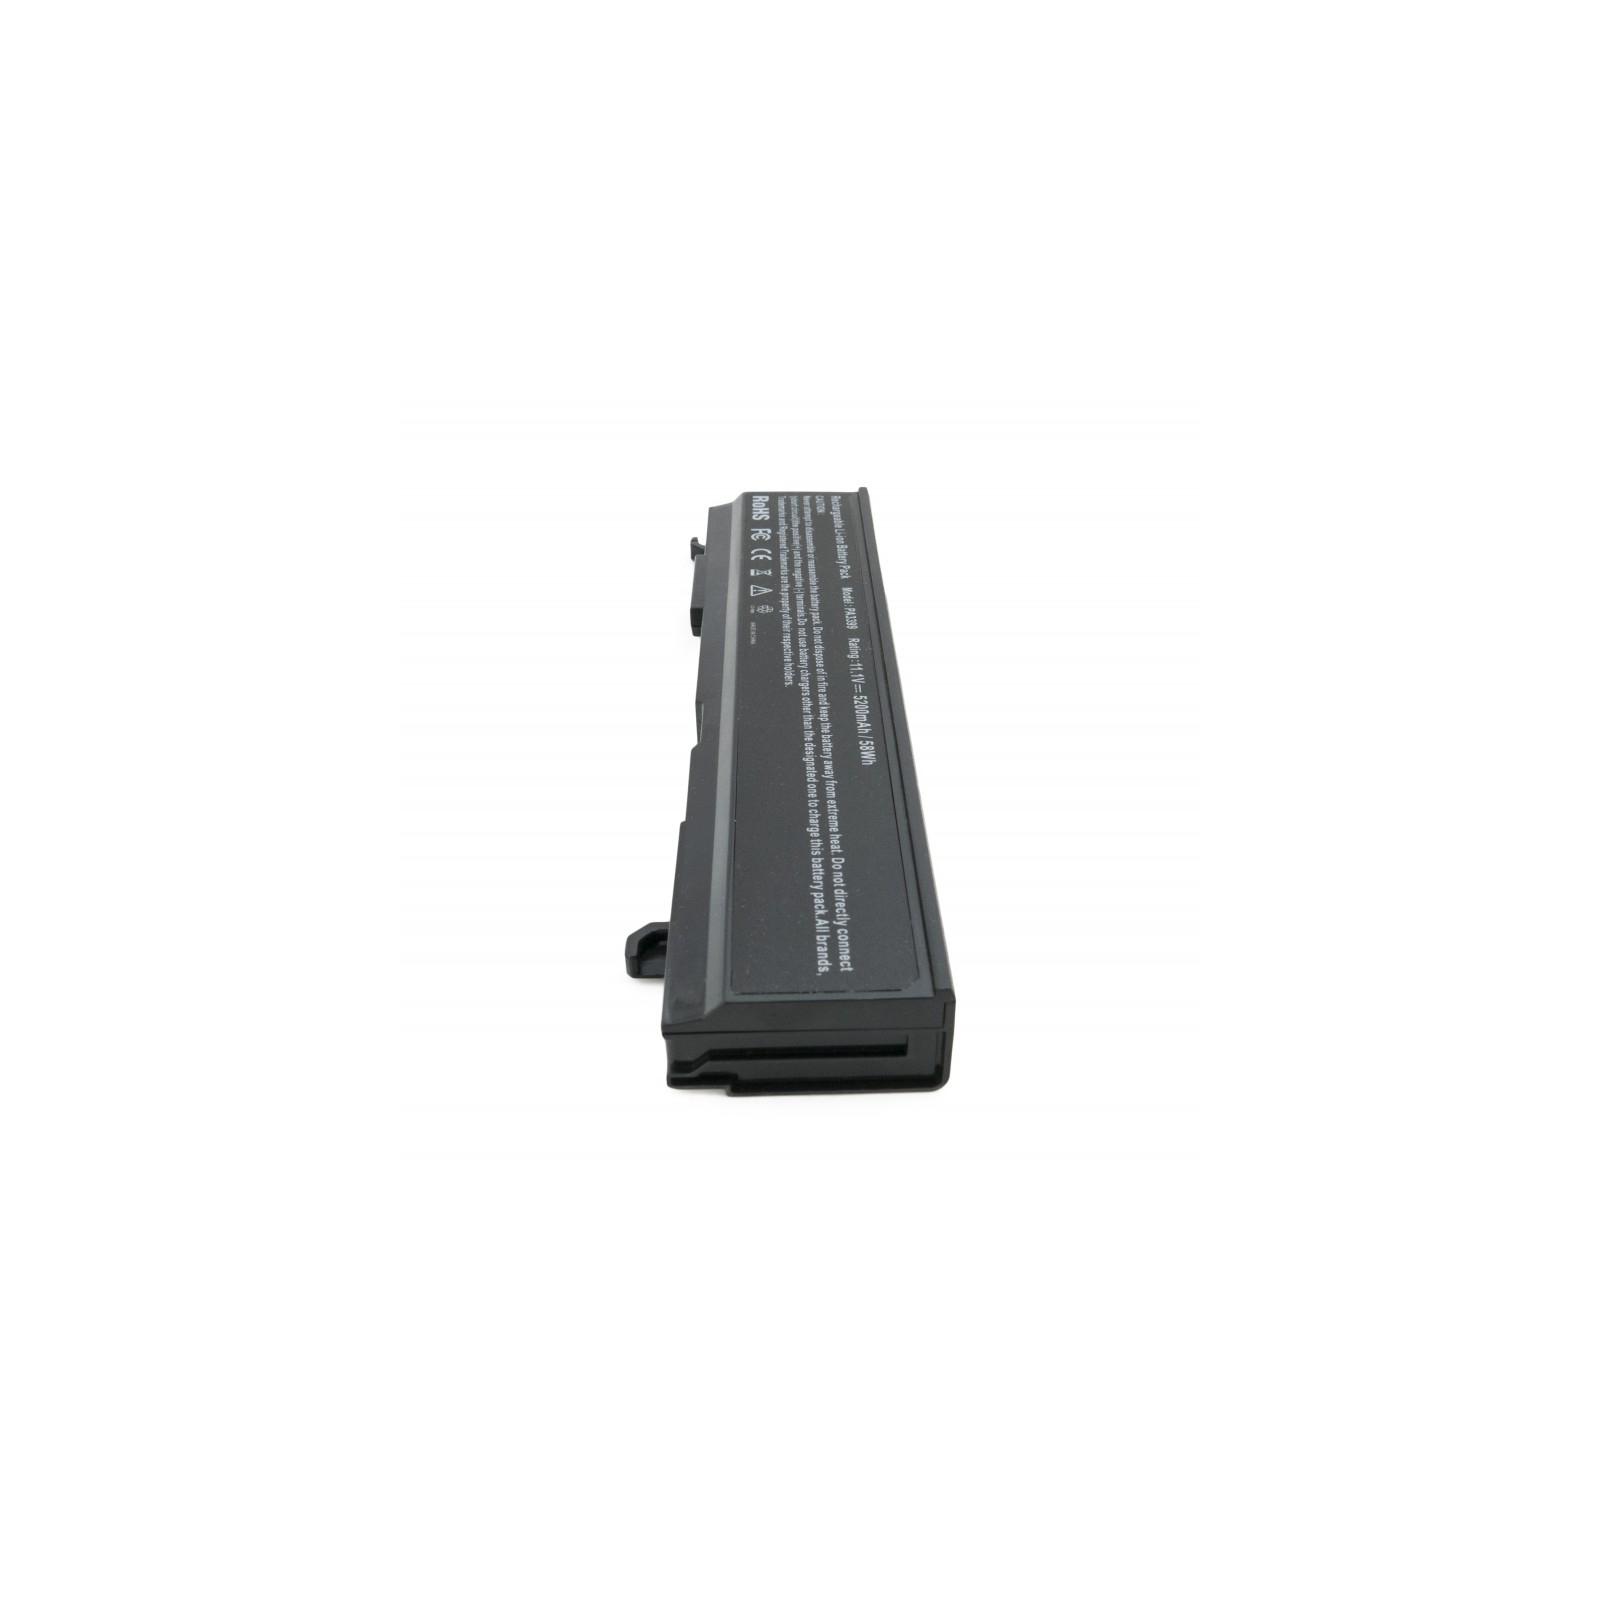 Аккумулятор для ноутбука Toshiba Satellite A80 (PA3399U) 5200 mAh EXTRADIGITAL (BNT3959) изображение 5